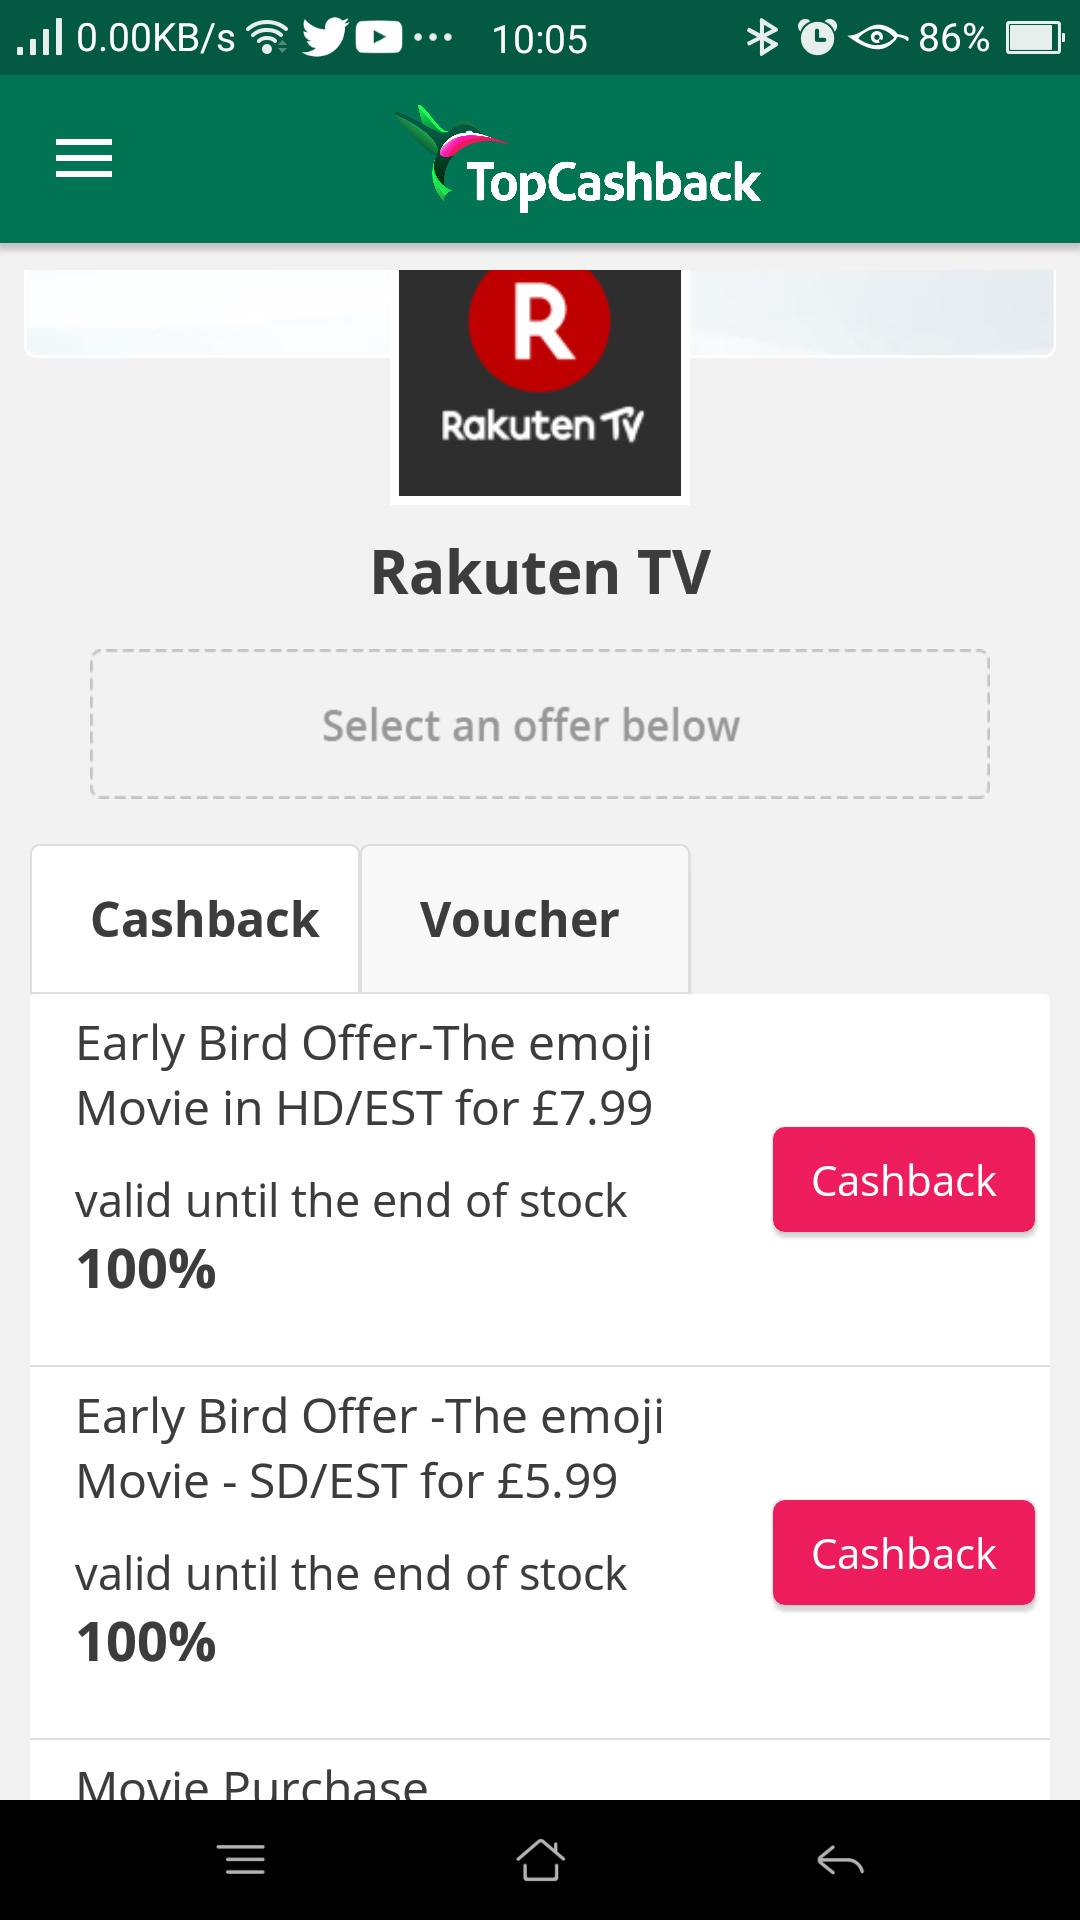 100% cashback on emoji HD or SD movie purchases at Rakuten Tv via TCB